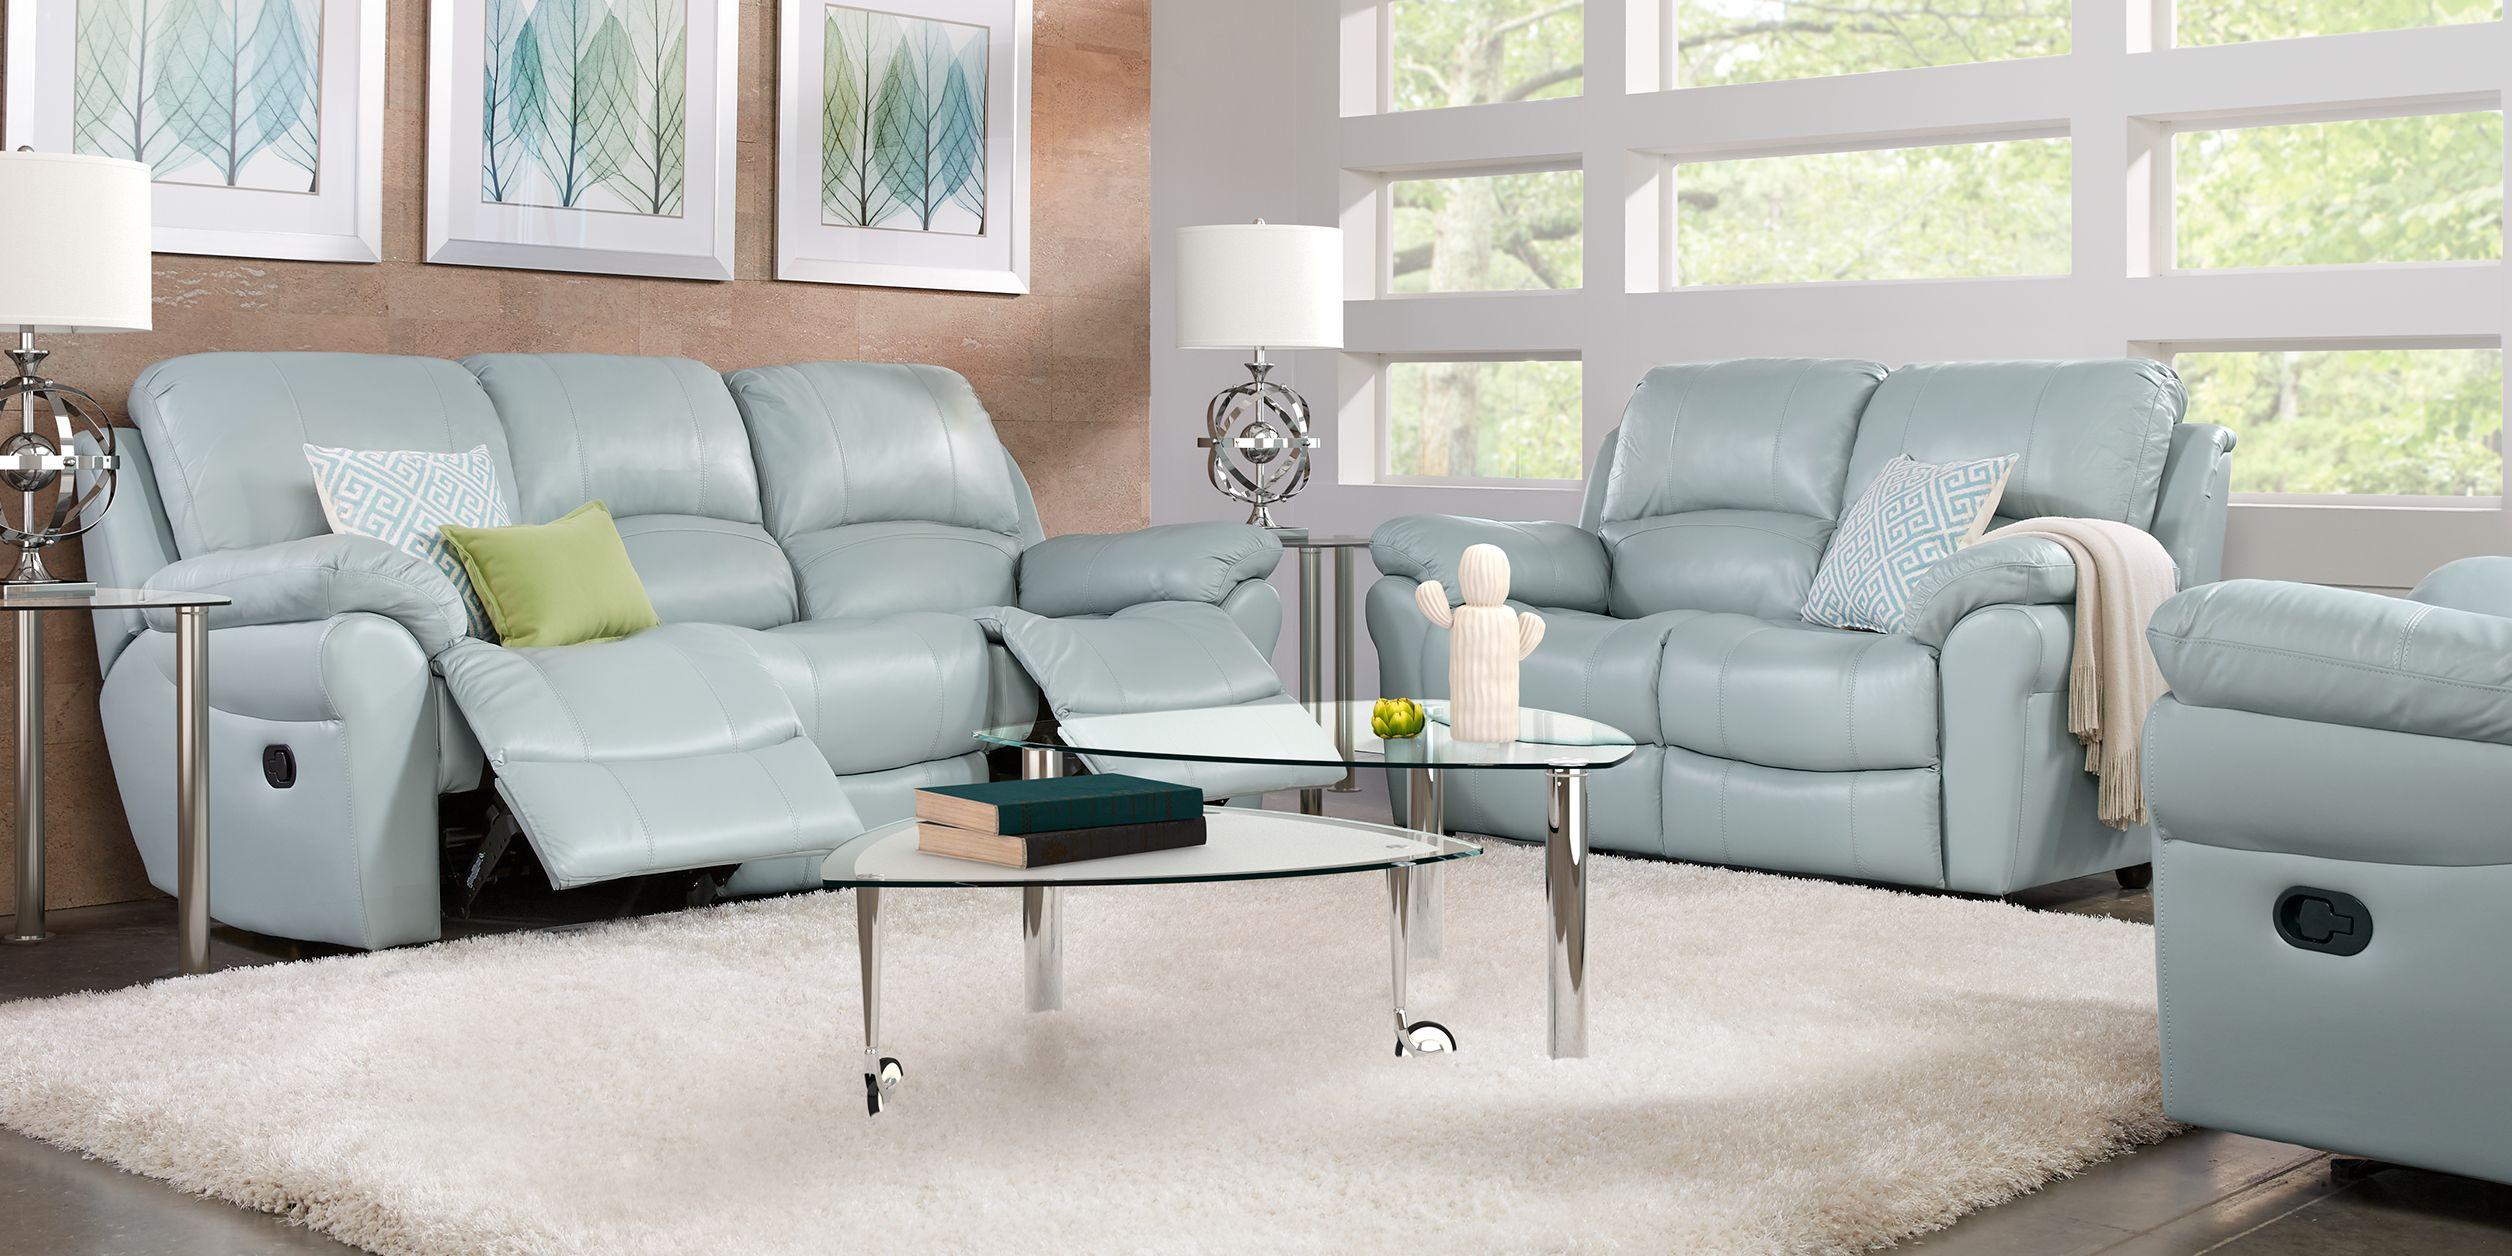 Vercelli Aqua Leather 7 Pc Living Room with Reclining Sofa